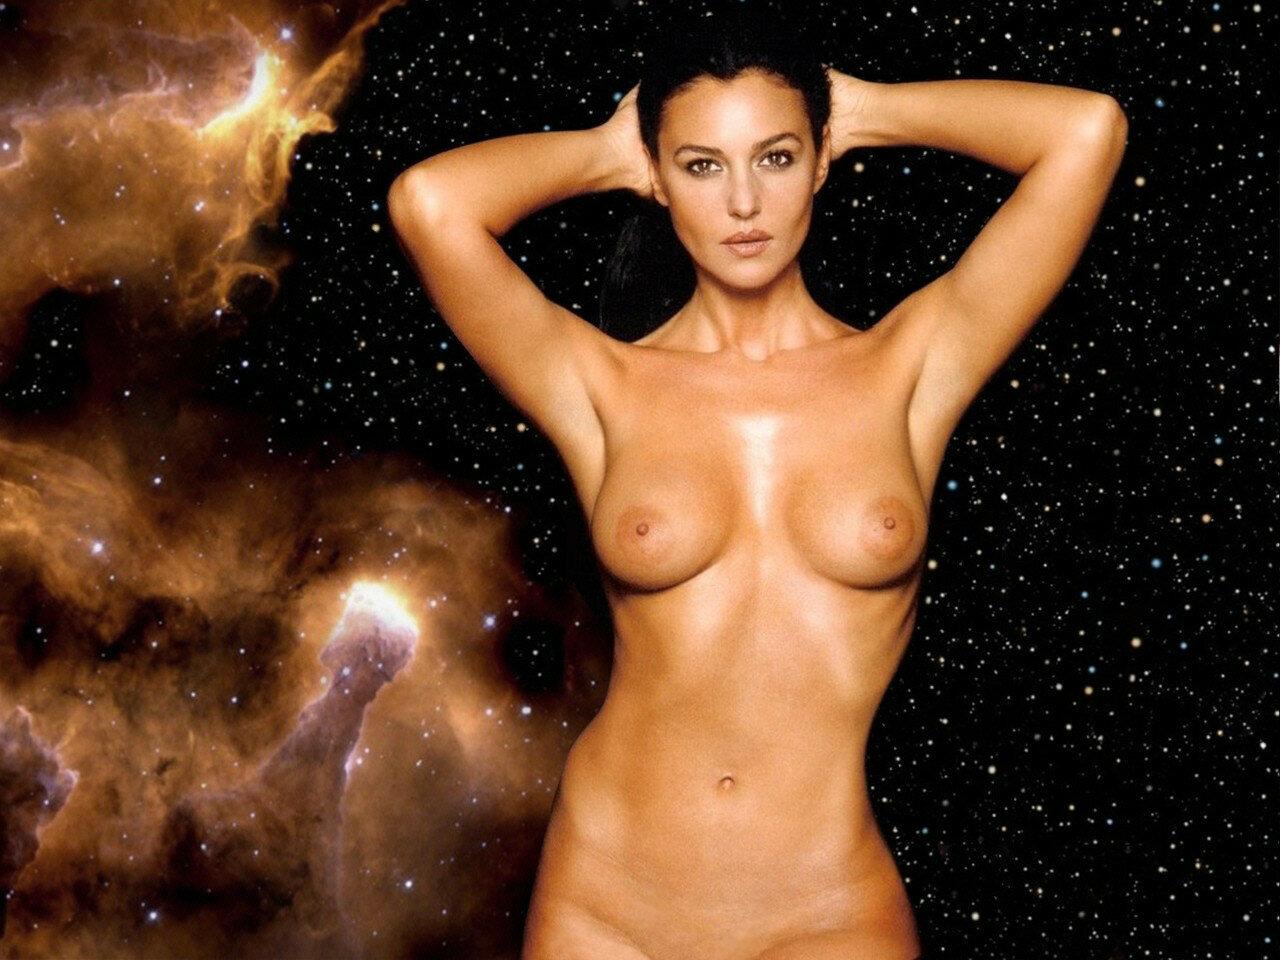 video-s-golie-zvezdi-ebut-vse-kto-zahochet